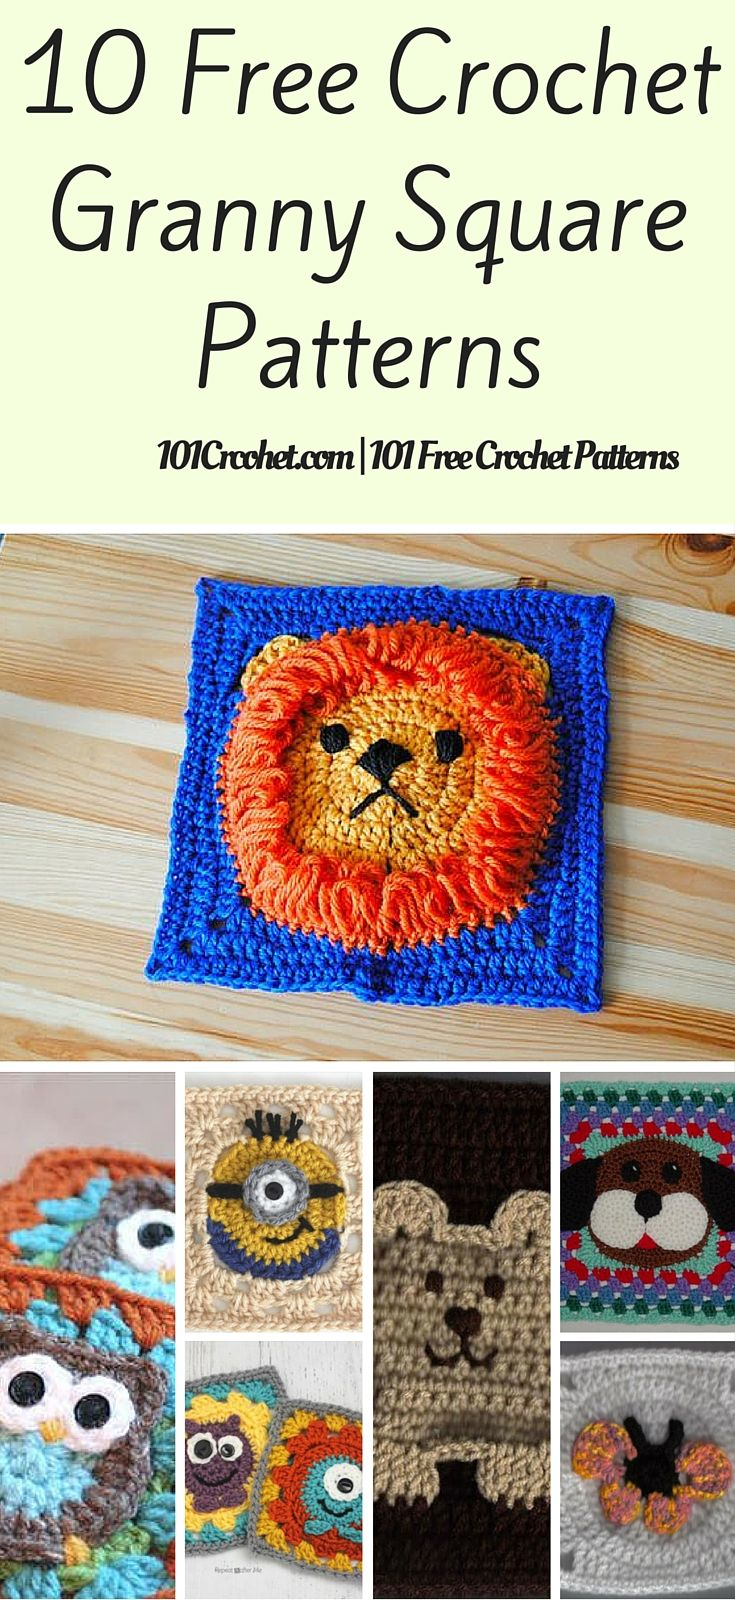 10 Free Crochet Granny Square Patterns   101 Crochet